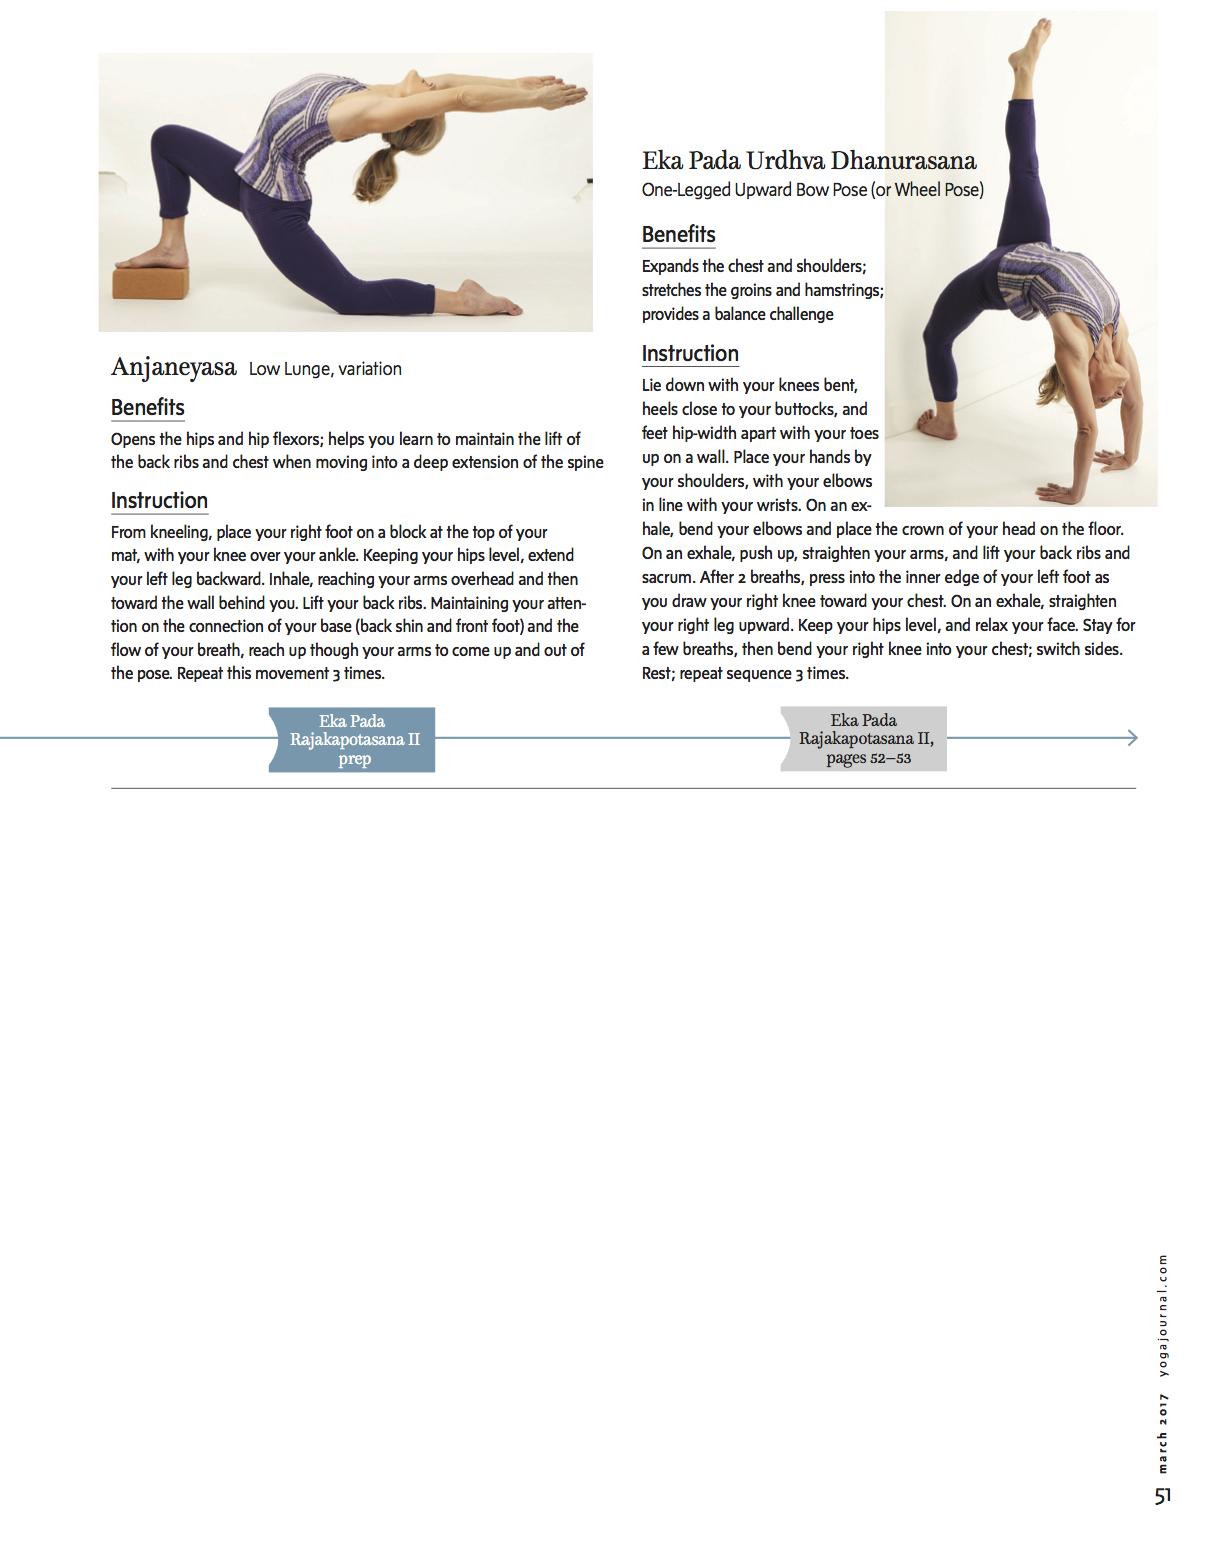 March Yogapedia page 4.jpg